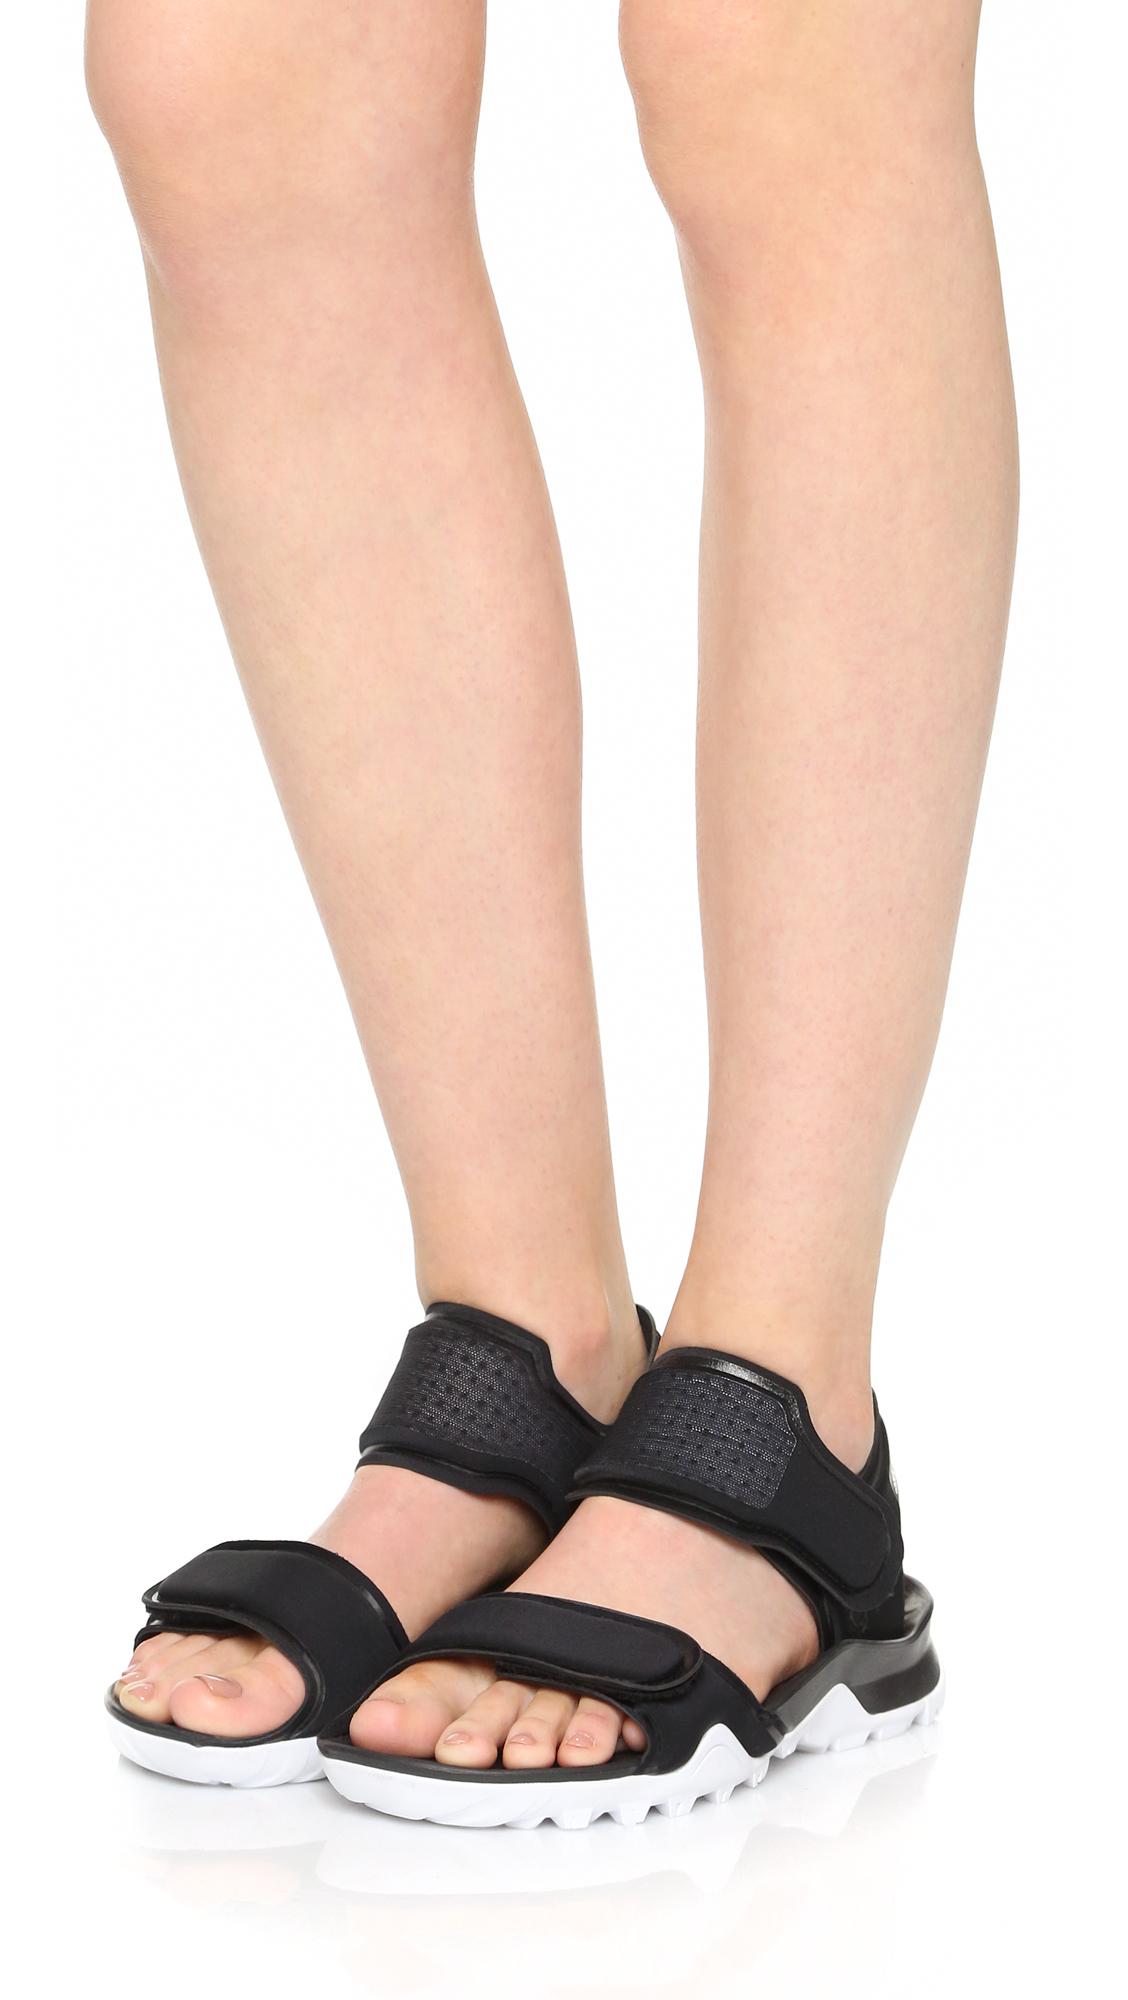 bbcb109006d6 adidas by Stella McCartney Hikira Sandals